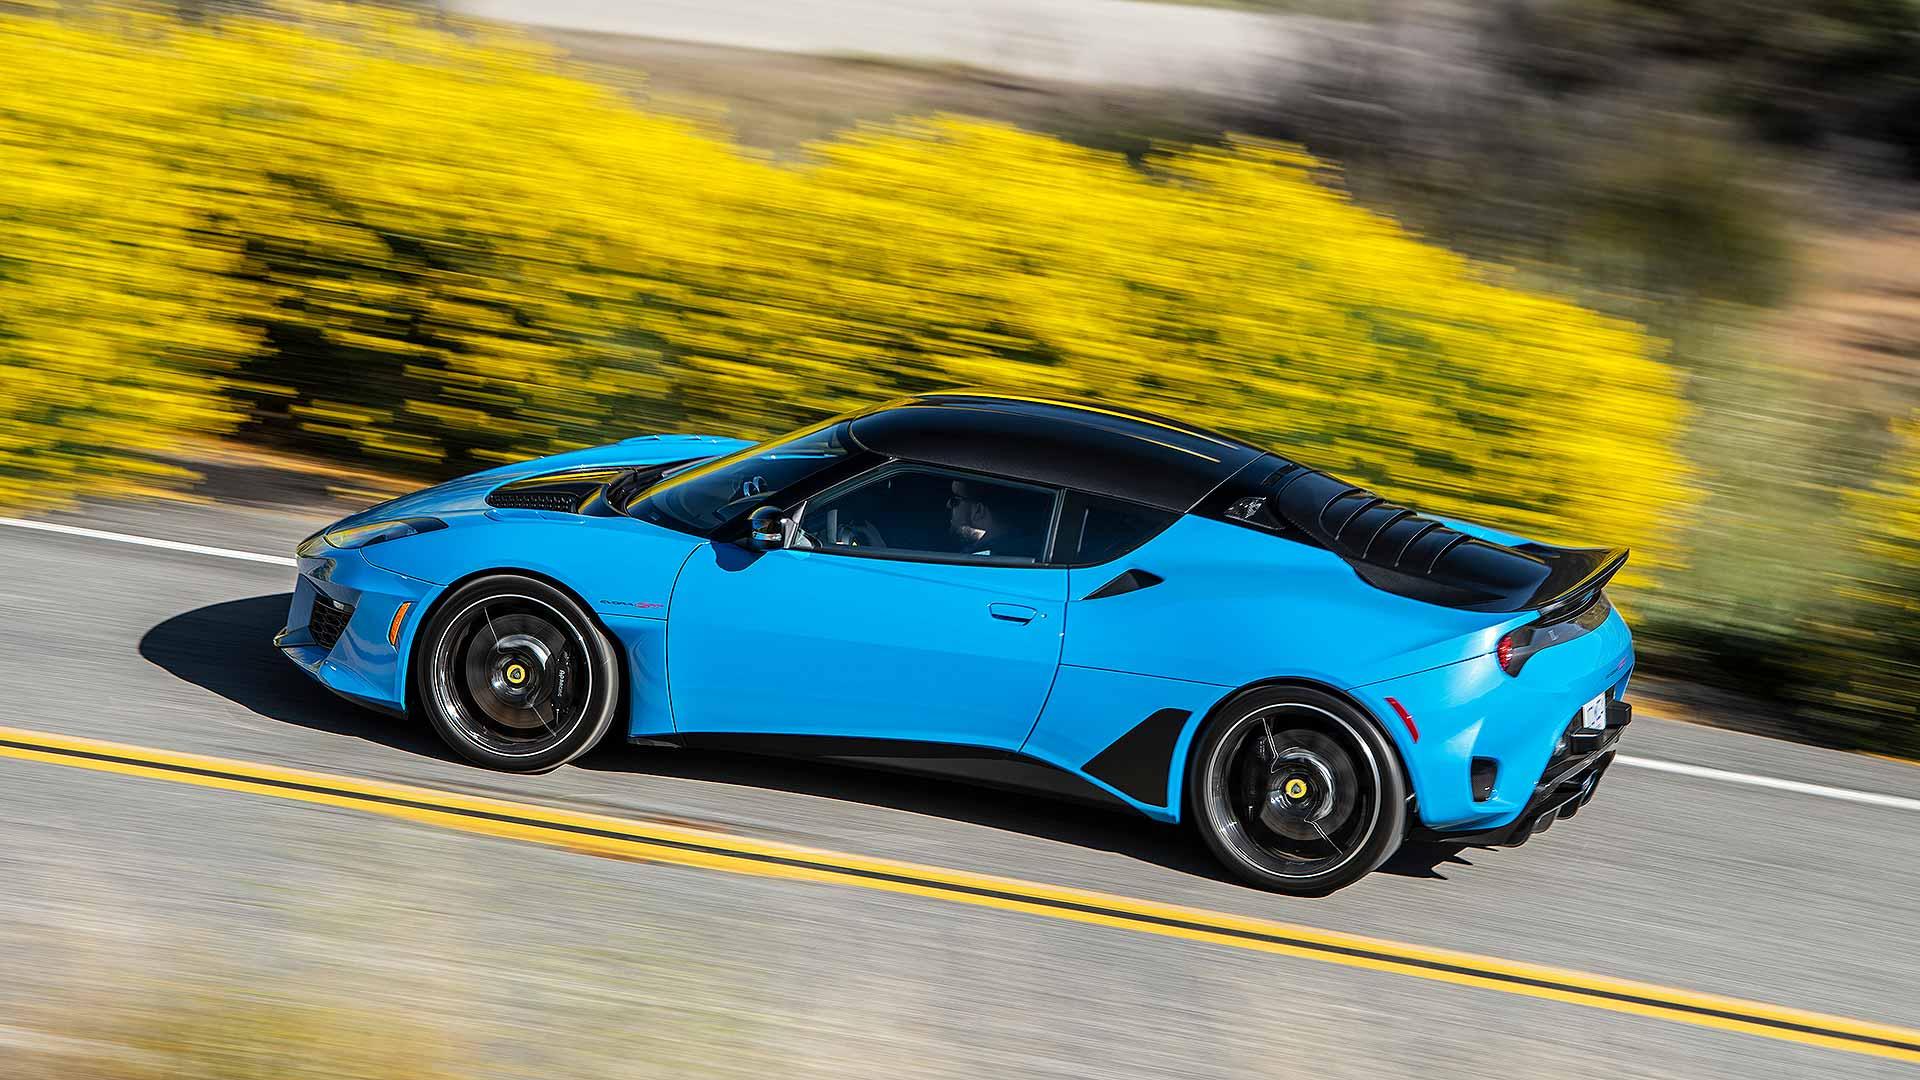 Lotus Evora GT in Cyan Blue